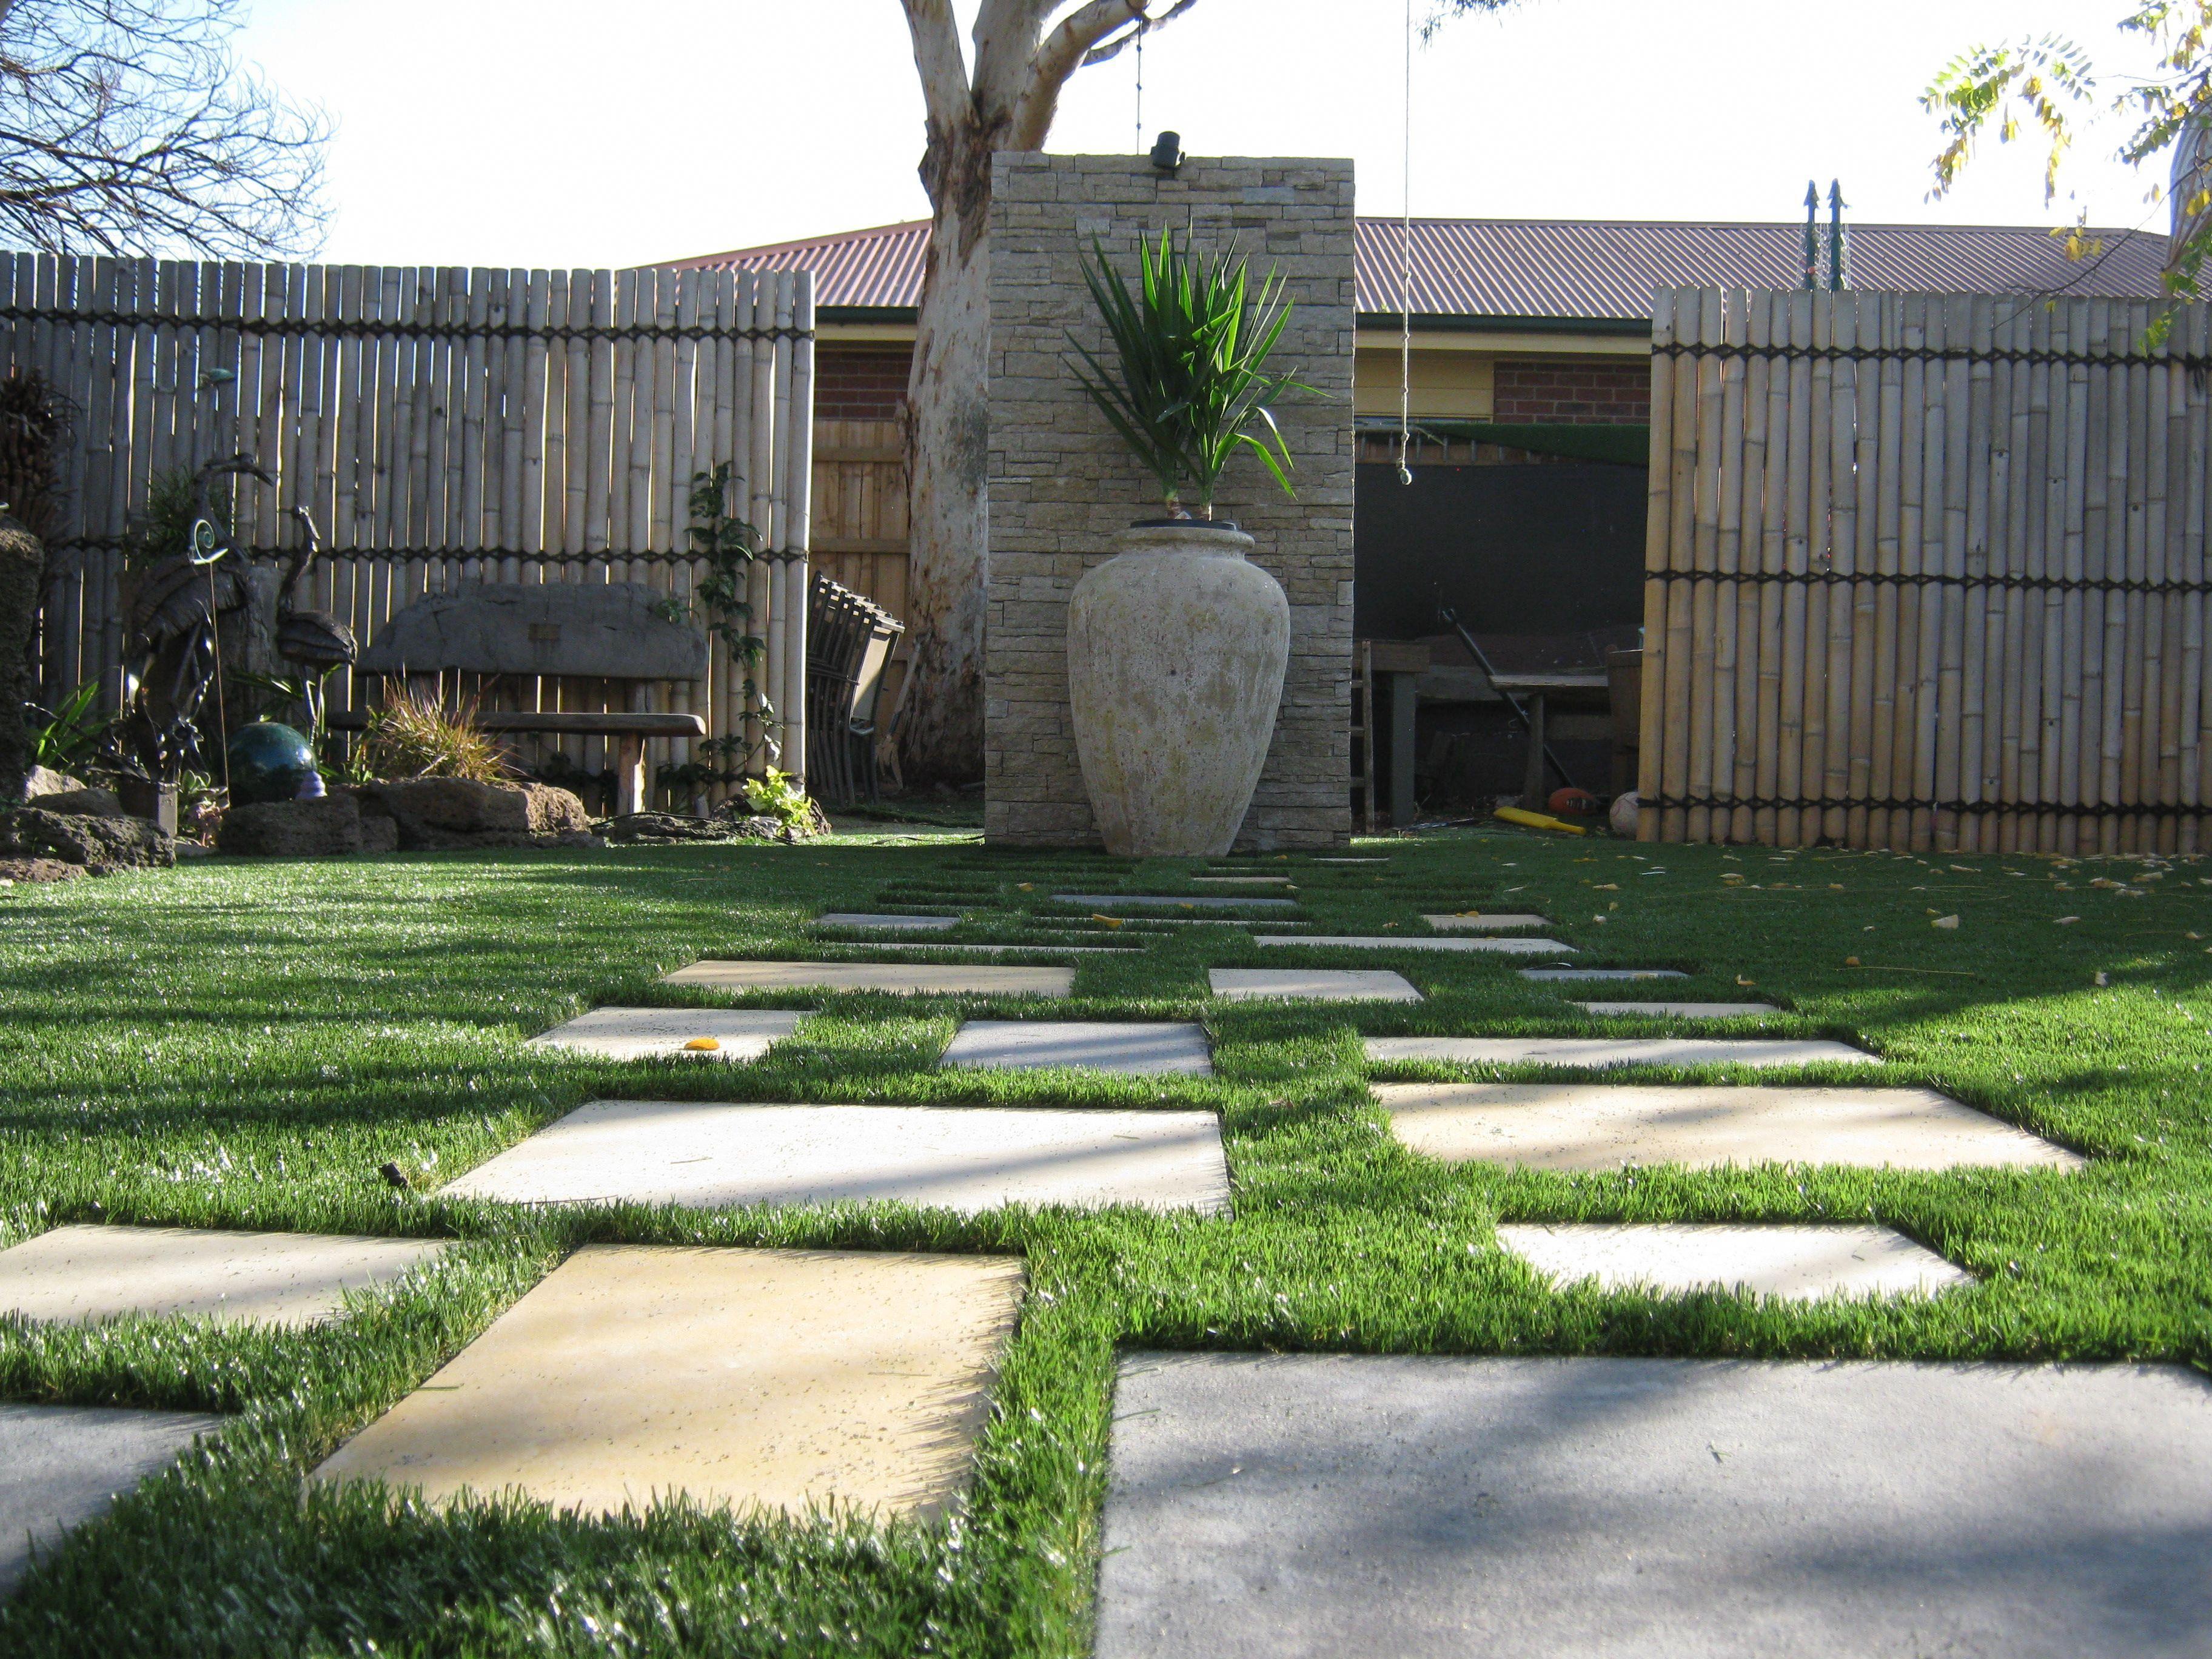 Backyard Garden Flowers Perennials And Perennial Garden Ideas Website In 2020 Backyard Garden Small Backyard Gardens Cottage Garden